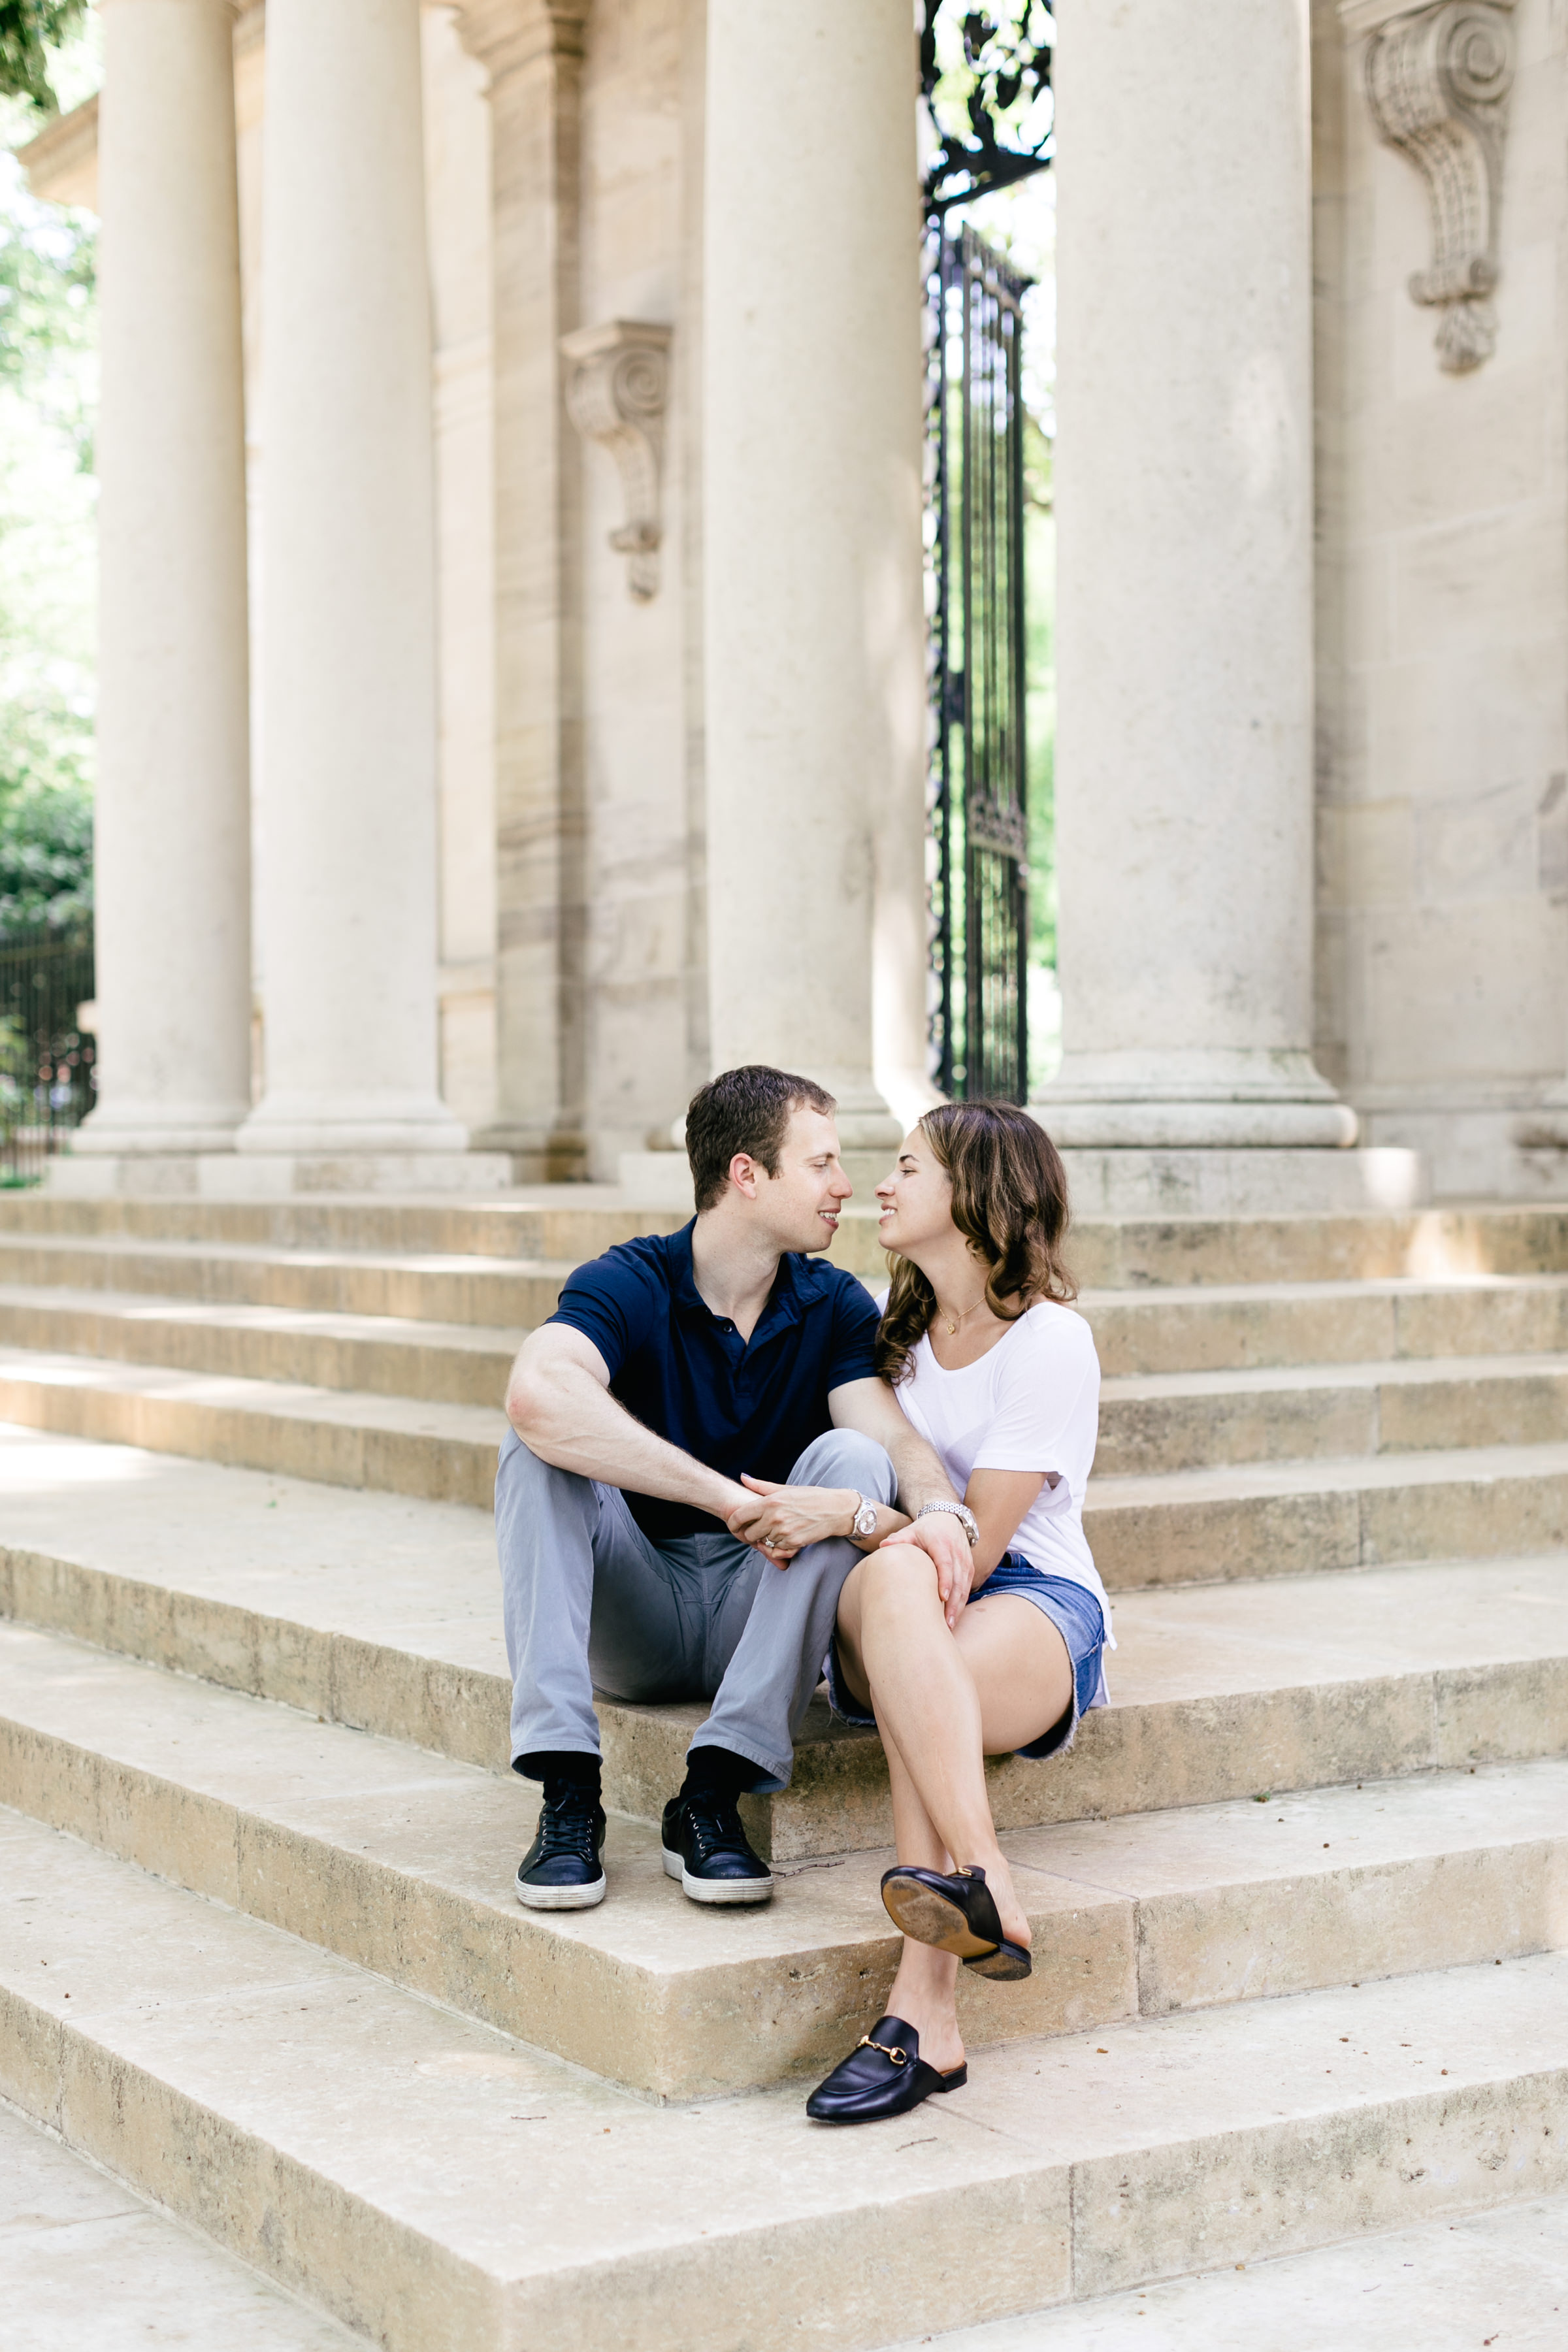 photography-natural-candid-engaged-proposal-philadelphia-wedding-rodin museum-barnes foundation-parkway-modern-lifestyle-20.JPG